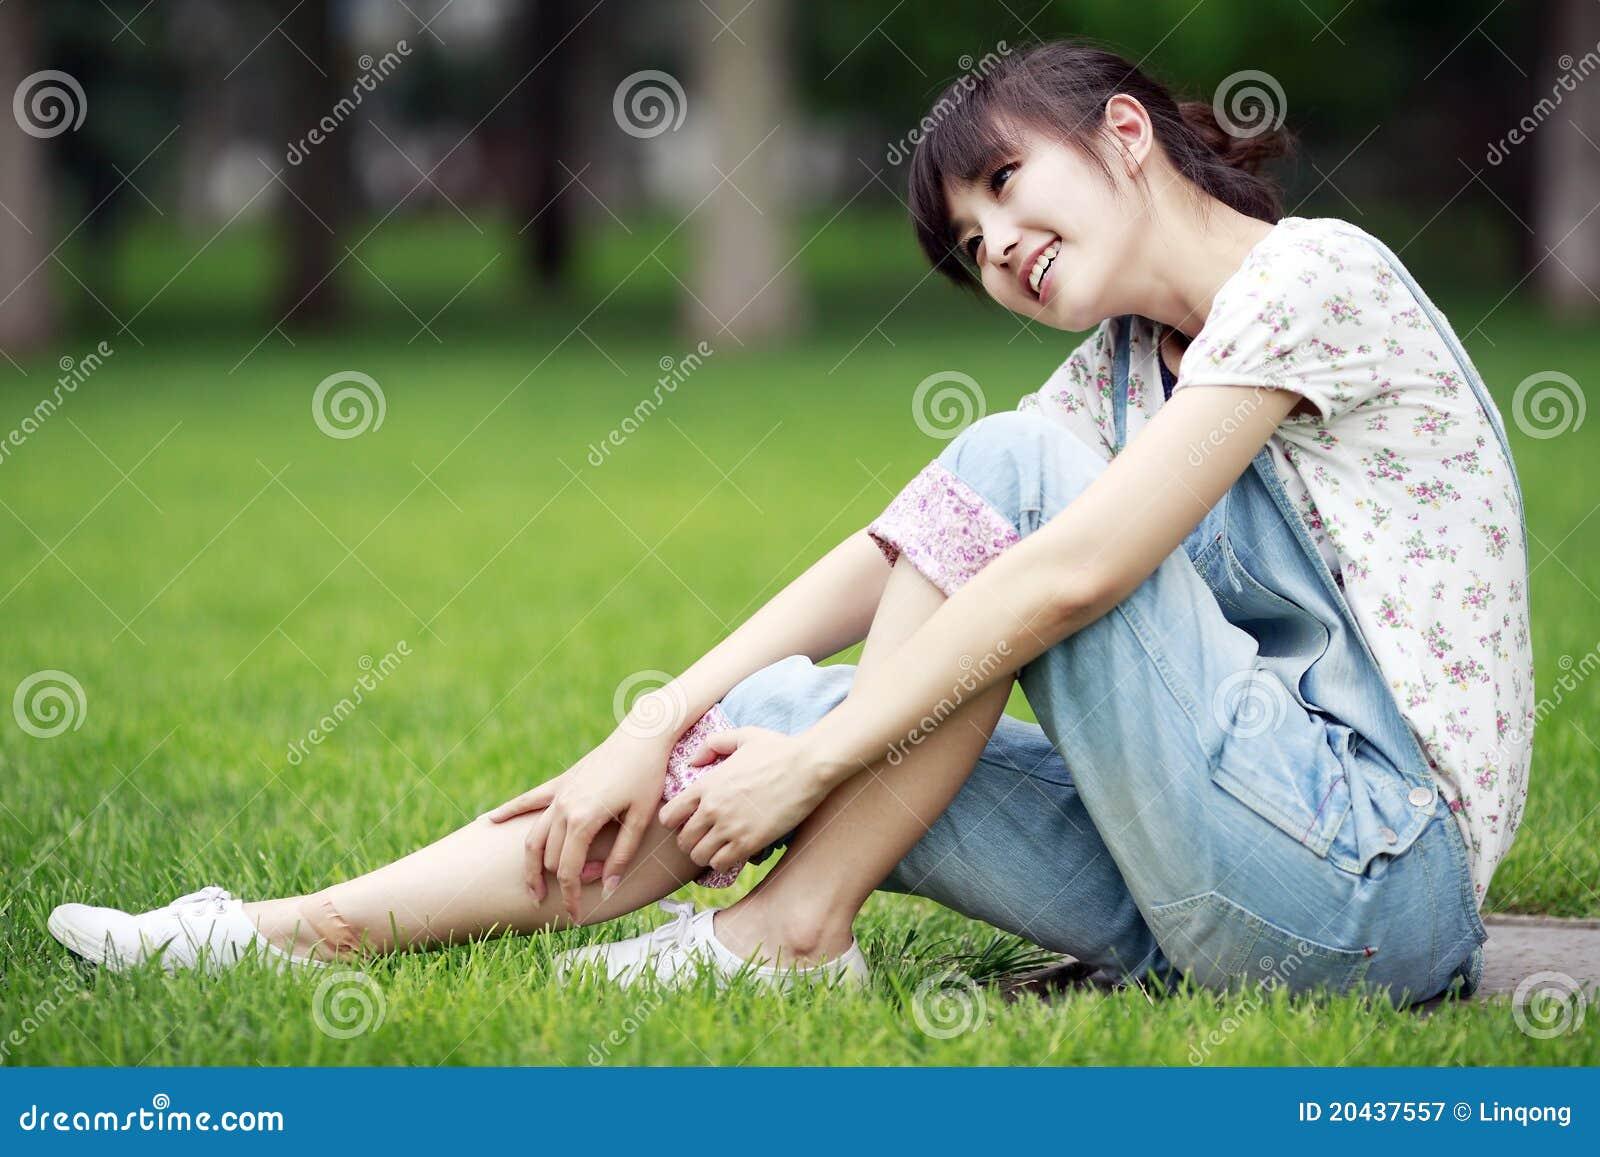 Asian girl relaxing outdoor